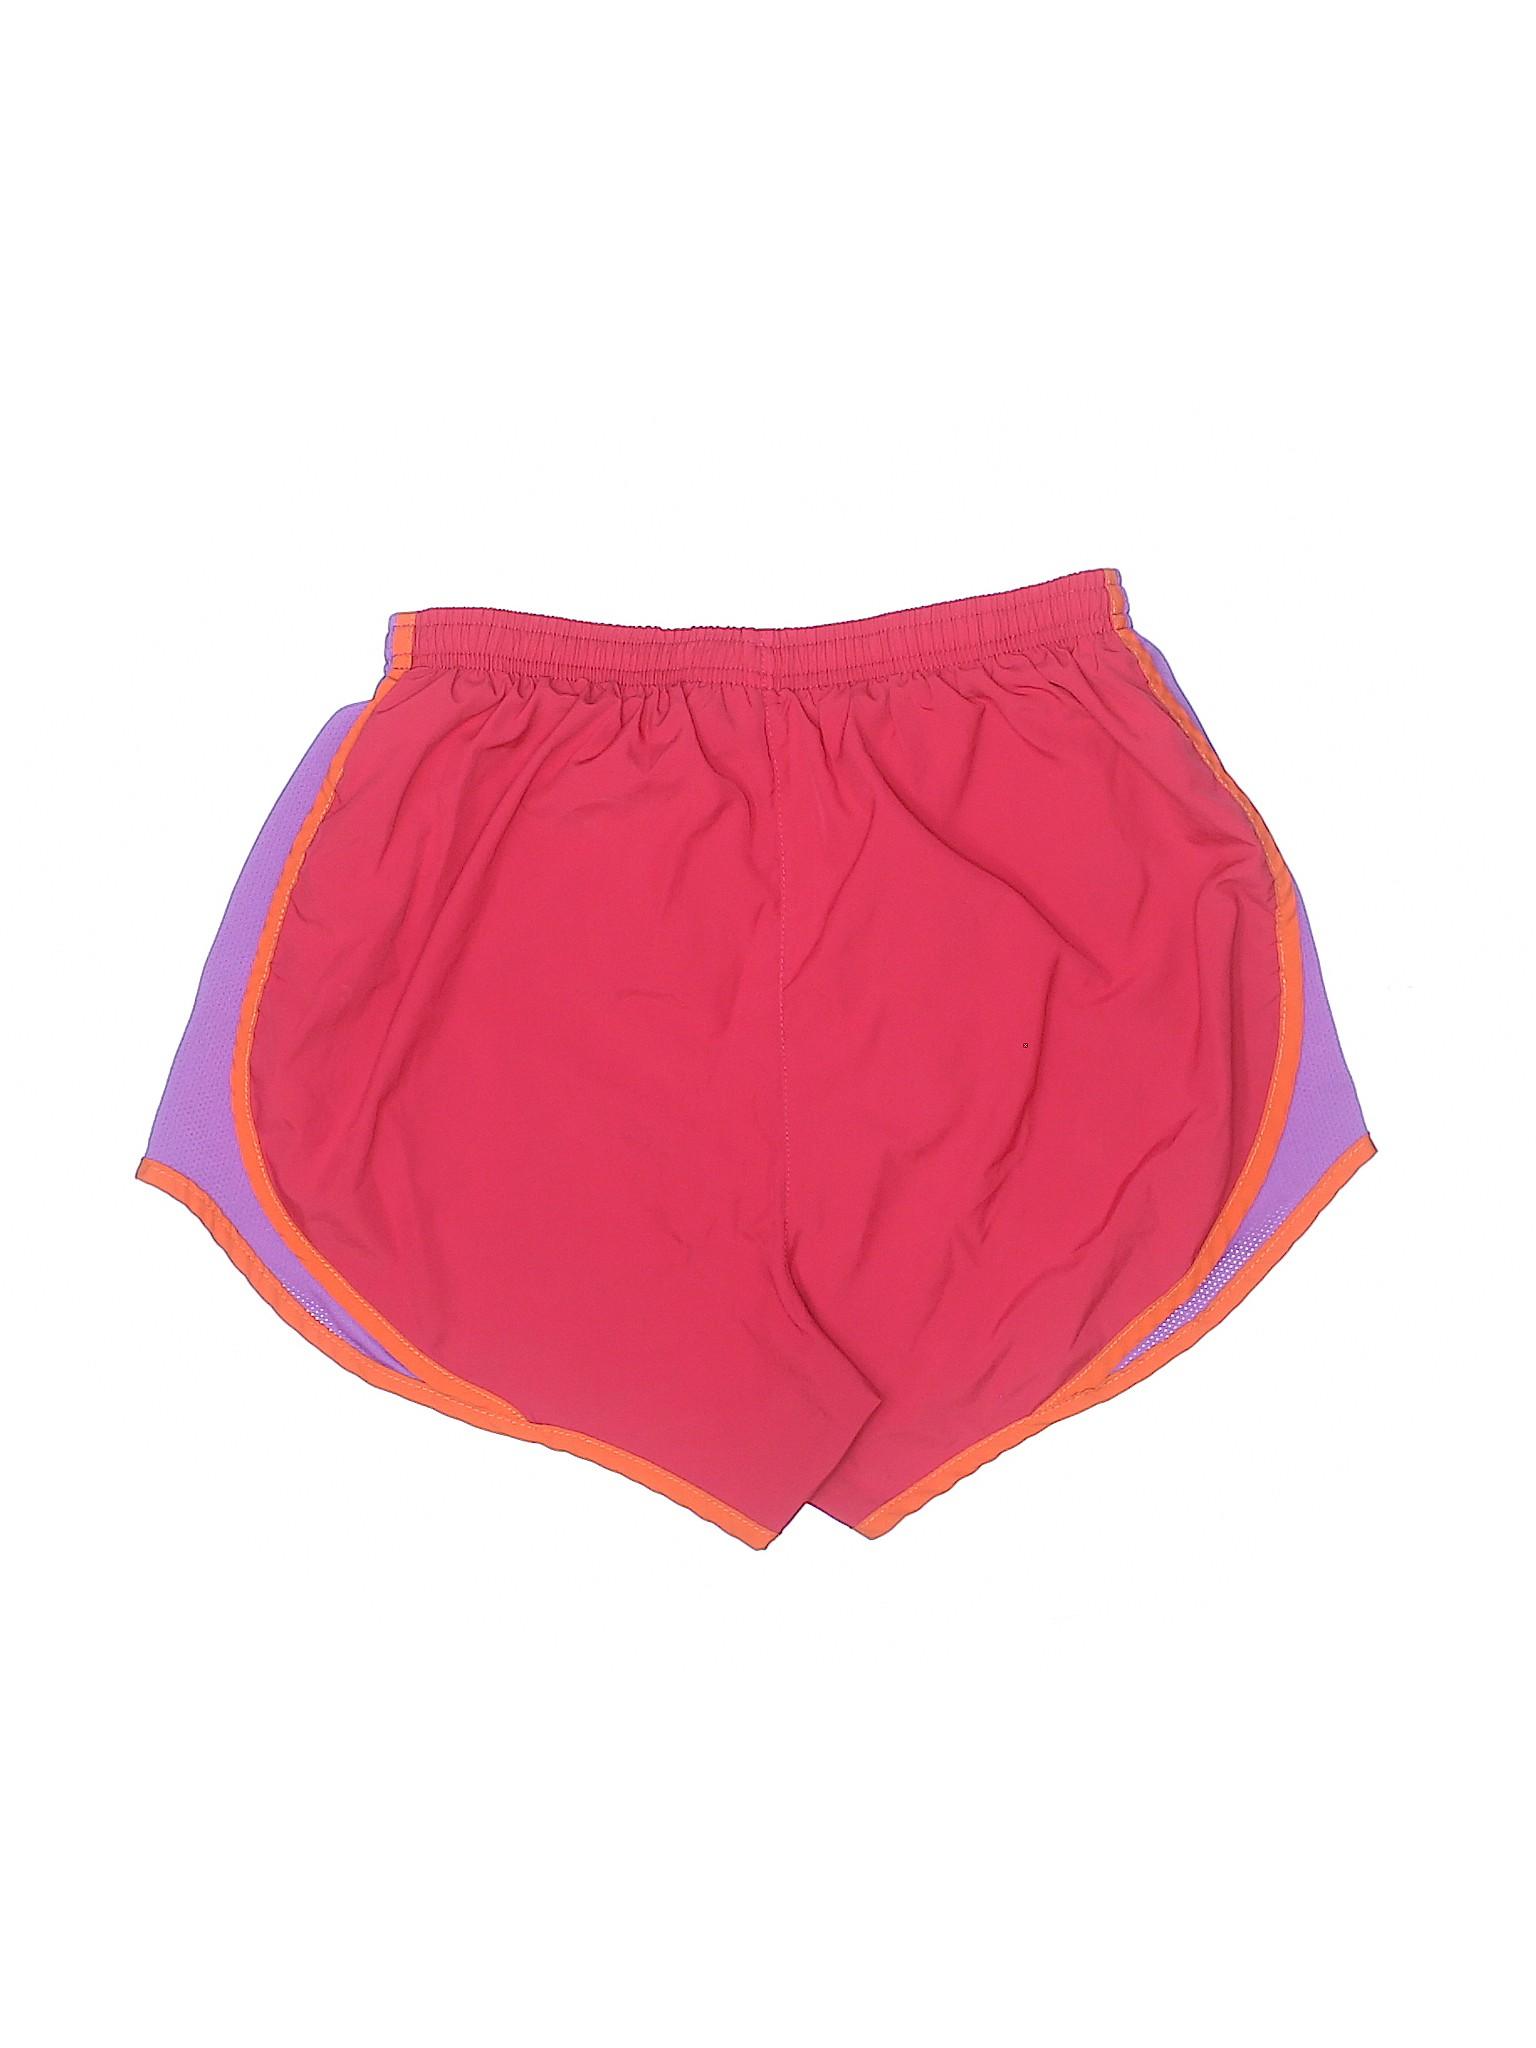 Boutique Nike Nike Athletic Athletic Shorts Boutique dxRwq0wt7